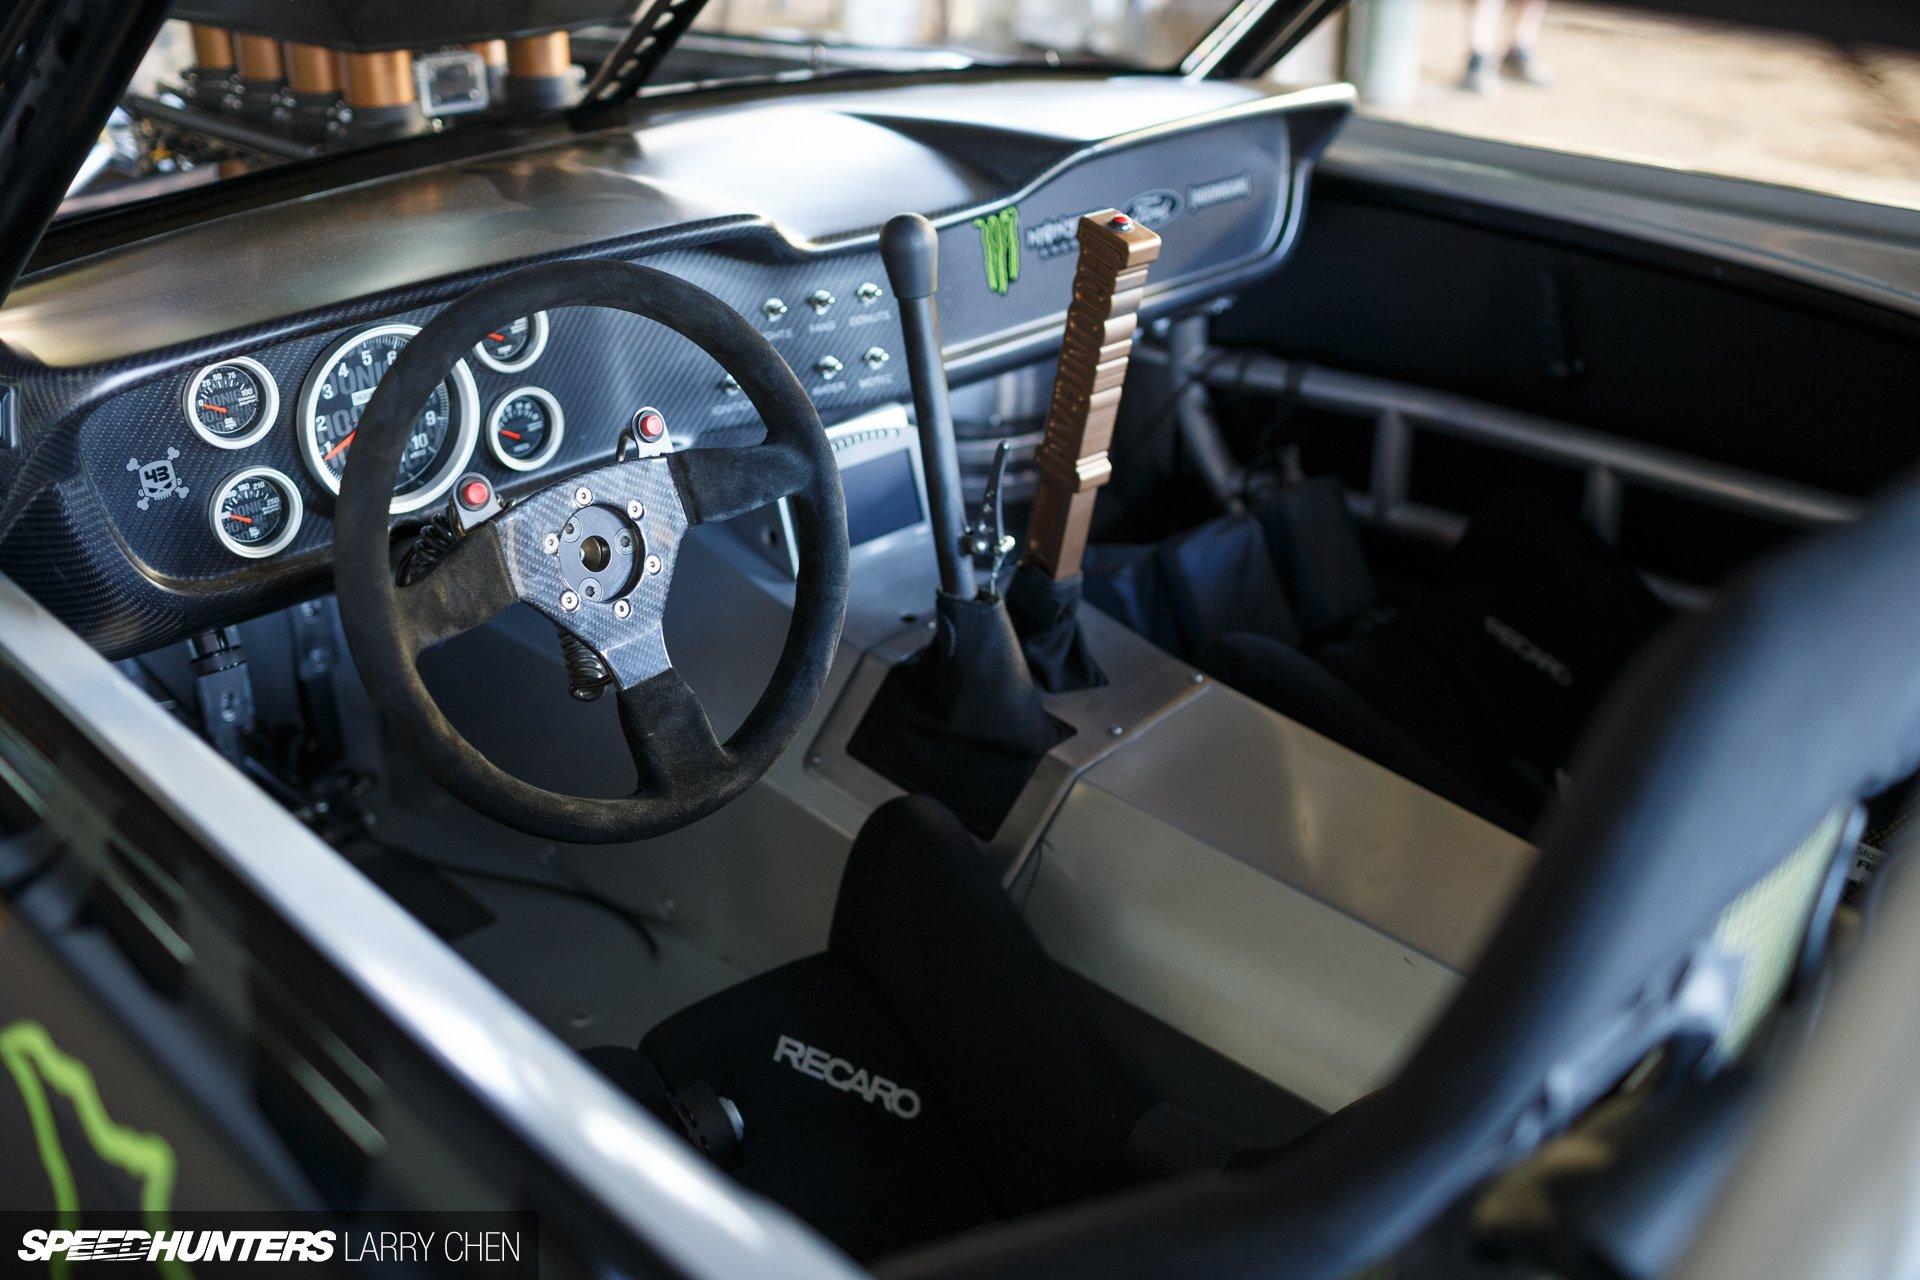 1965 Ford Mustang Hoonigan Asd Gymkhana Seven Drift Hot